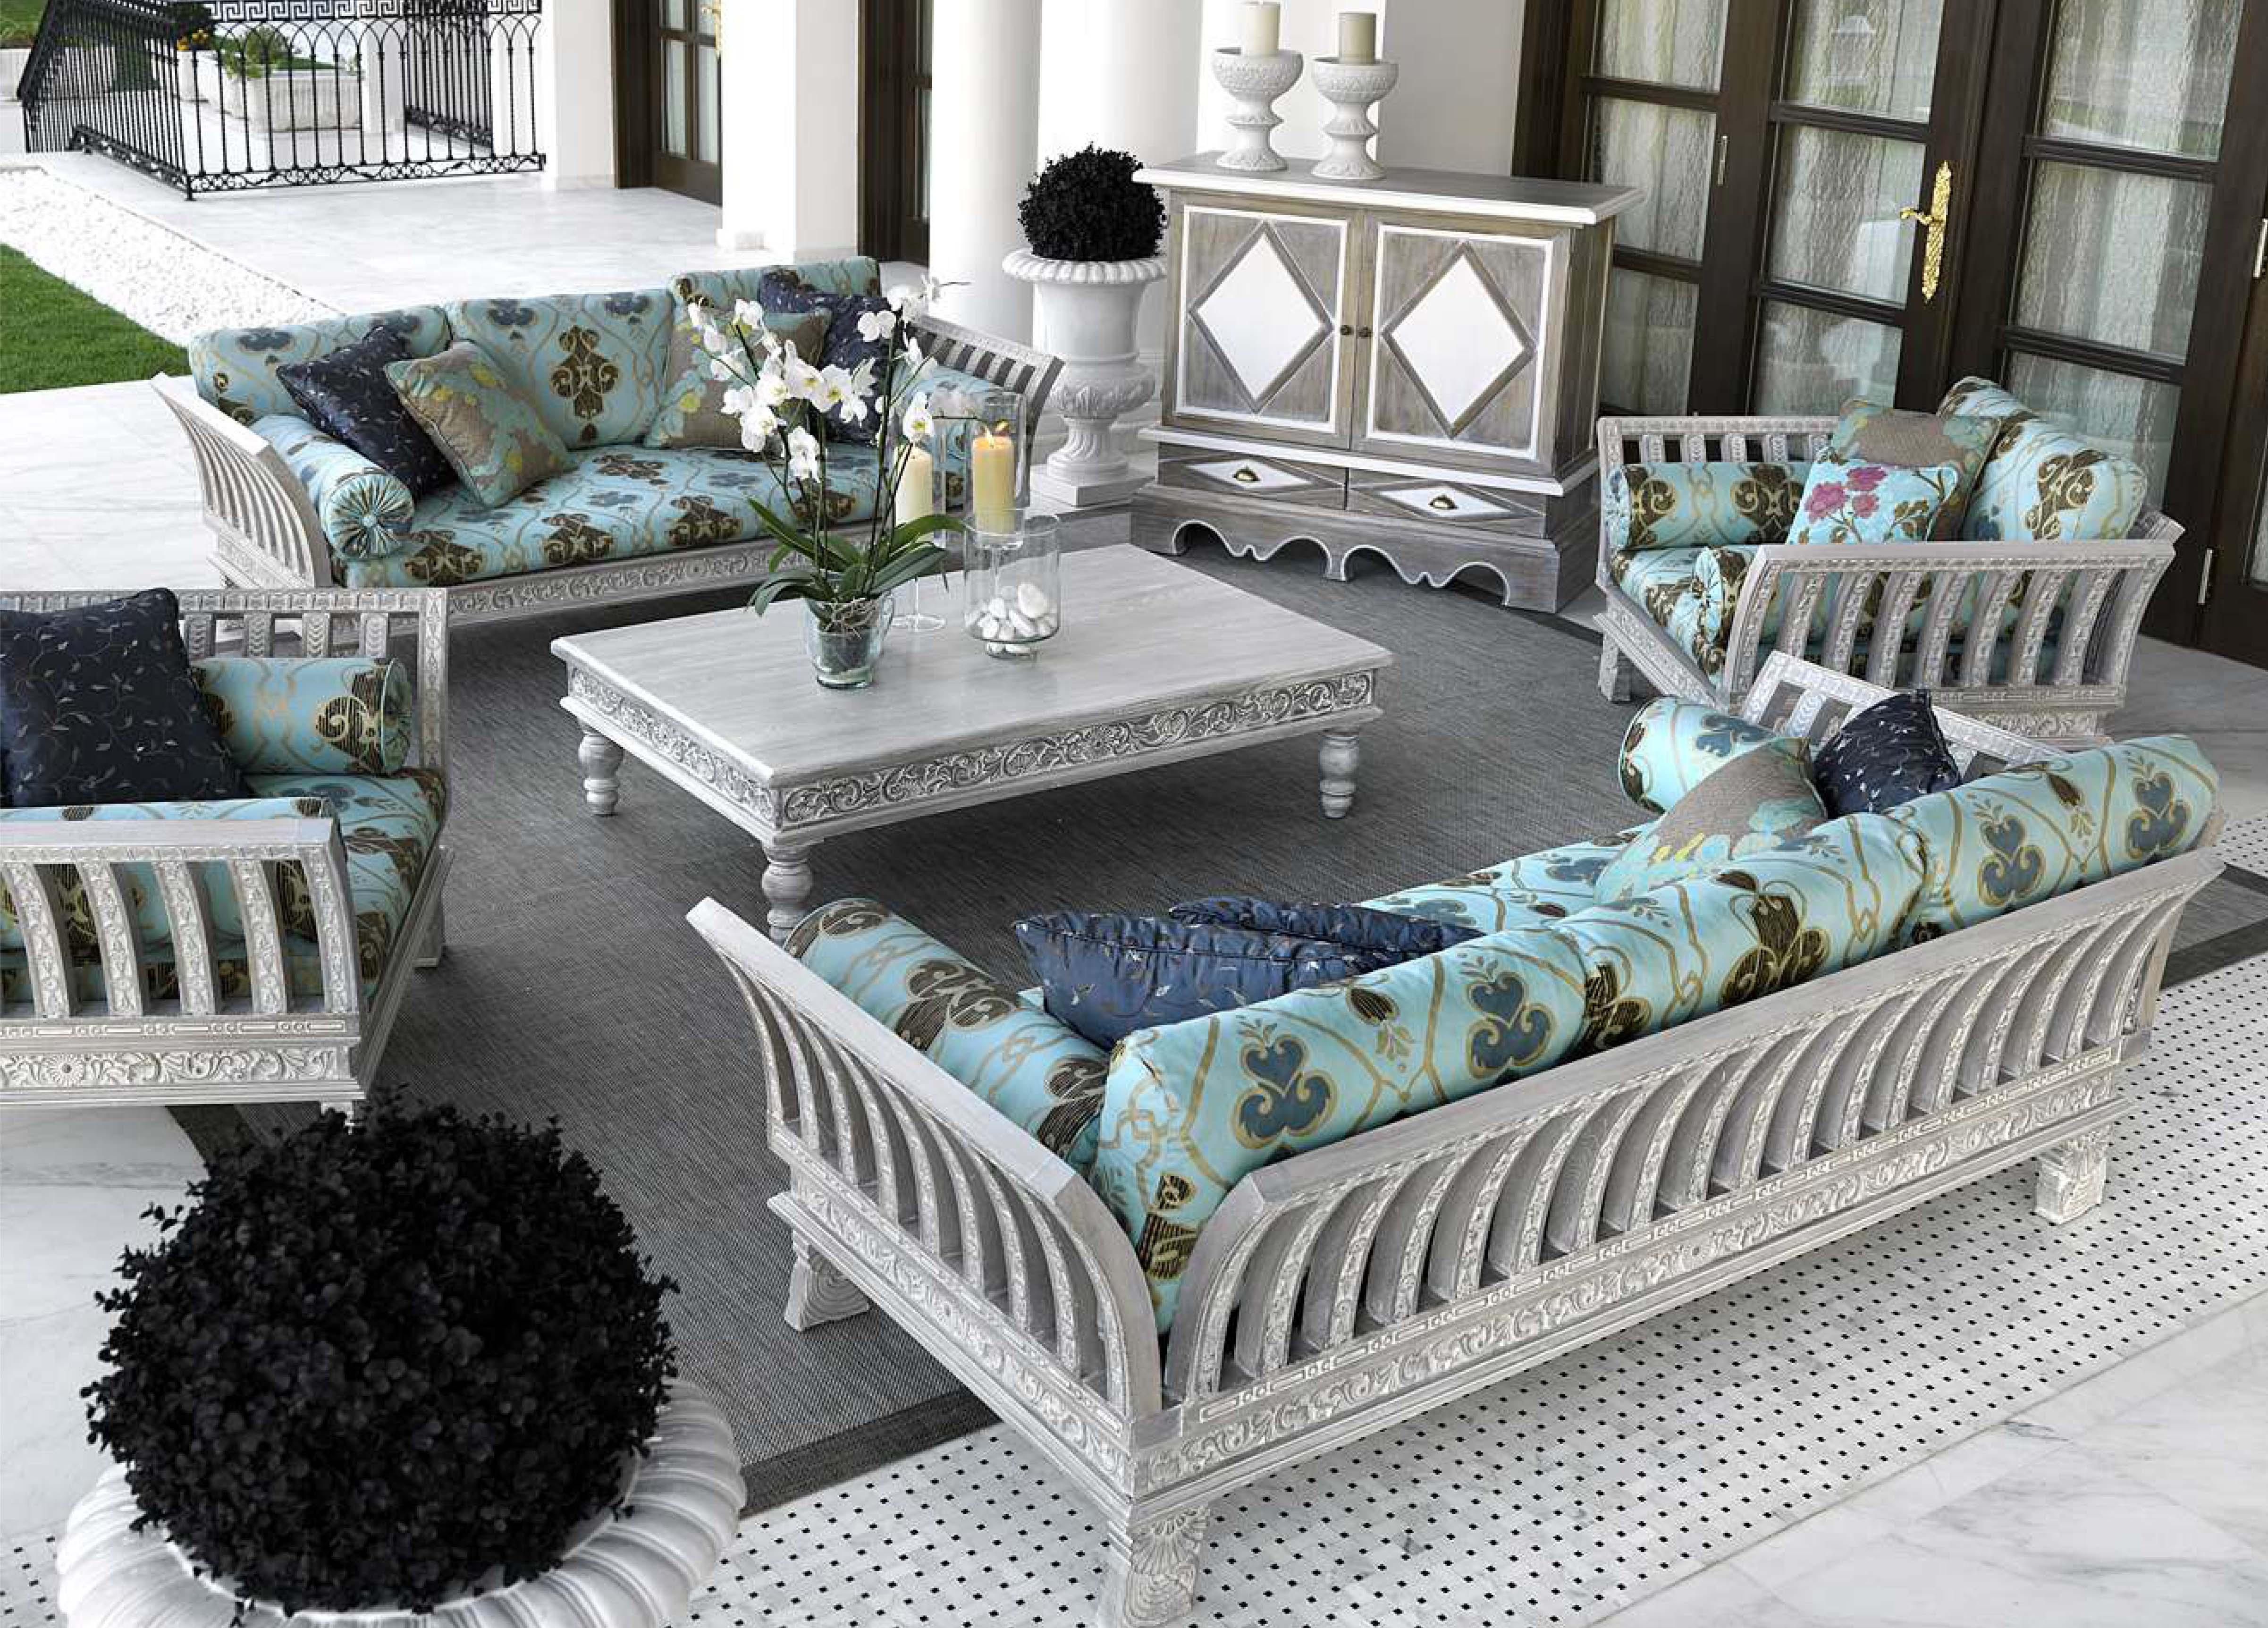 Luxury Garden Patio Furniture Sets (8)++ Ideas #LGPFS